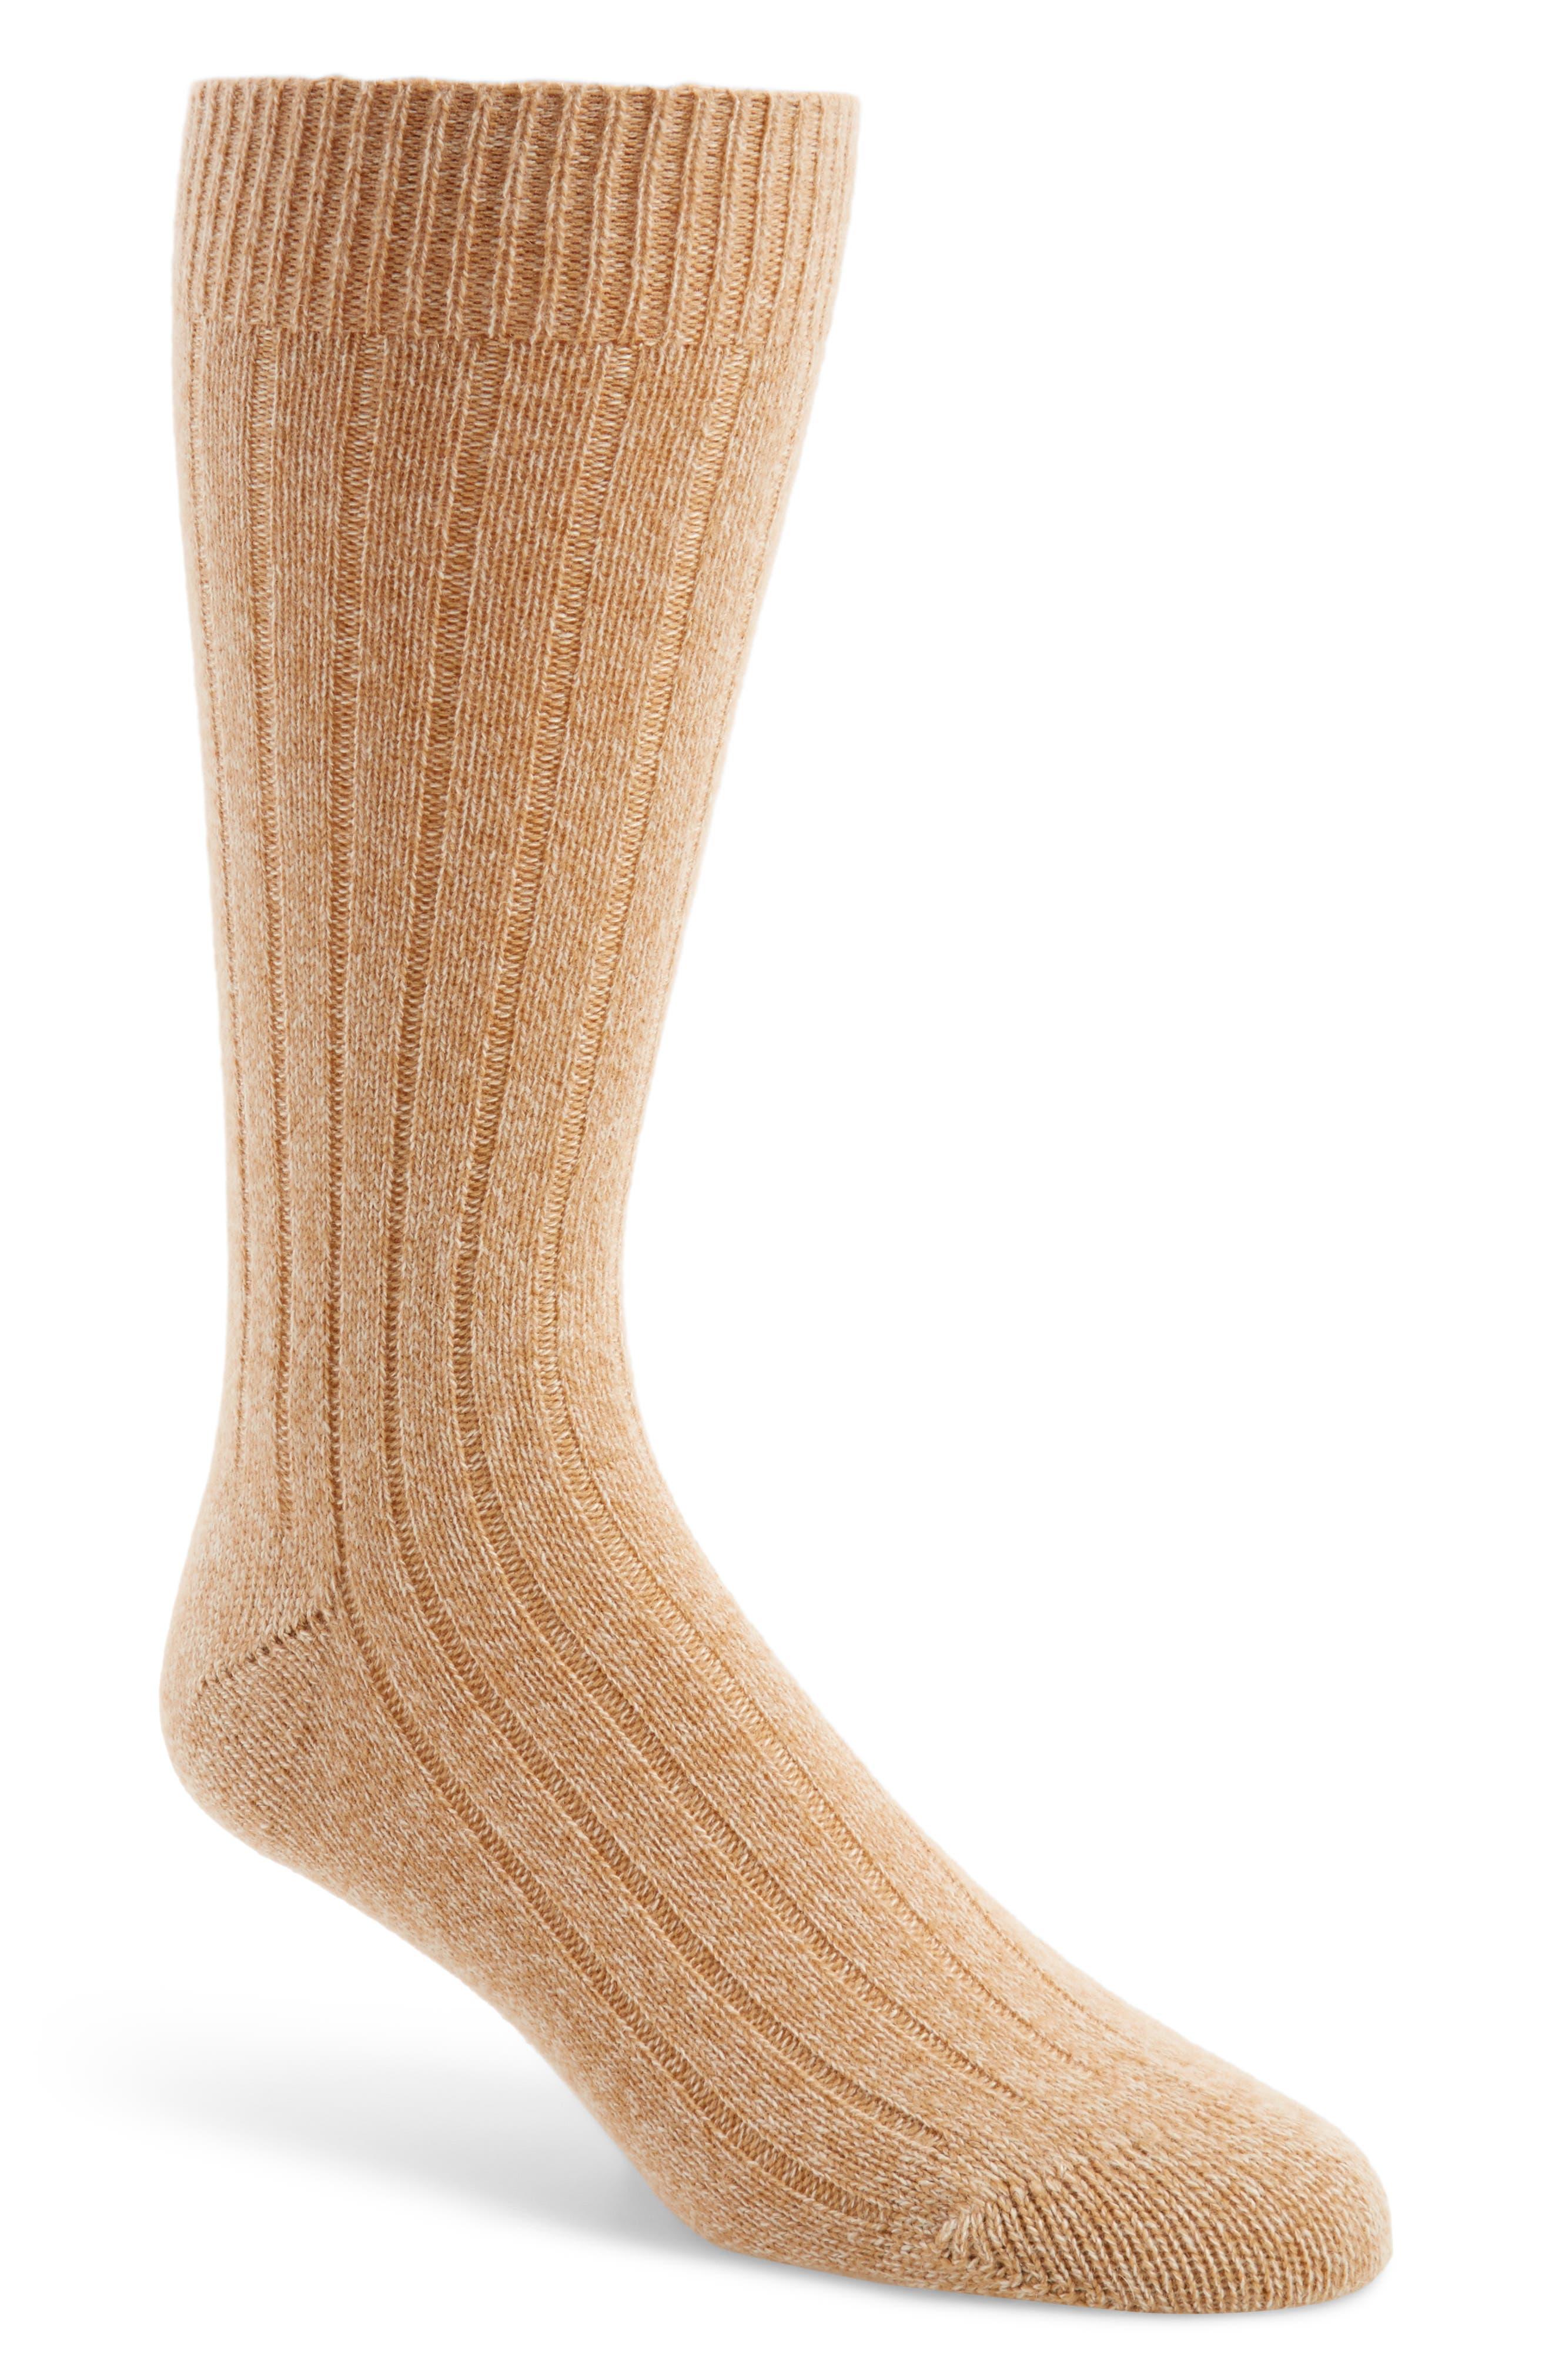 'Waddington' Cashmere Blend Mid Calf Socks,                             Main thumbnail 1, color,